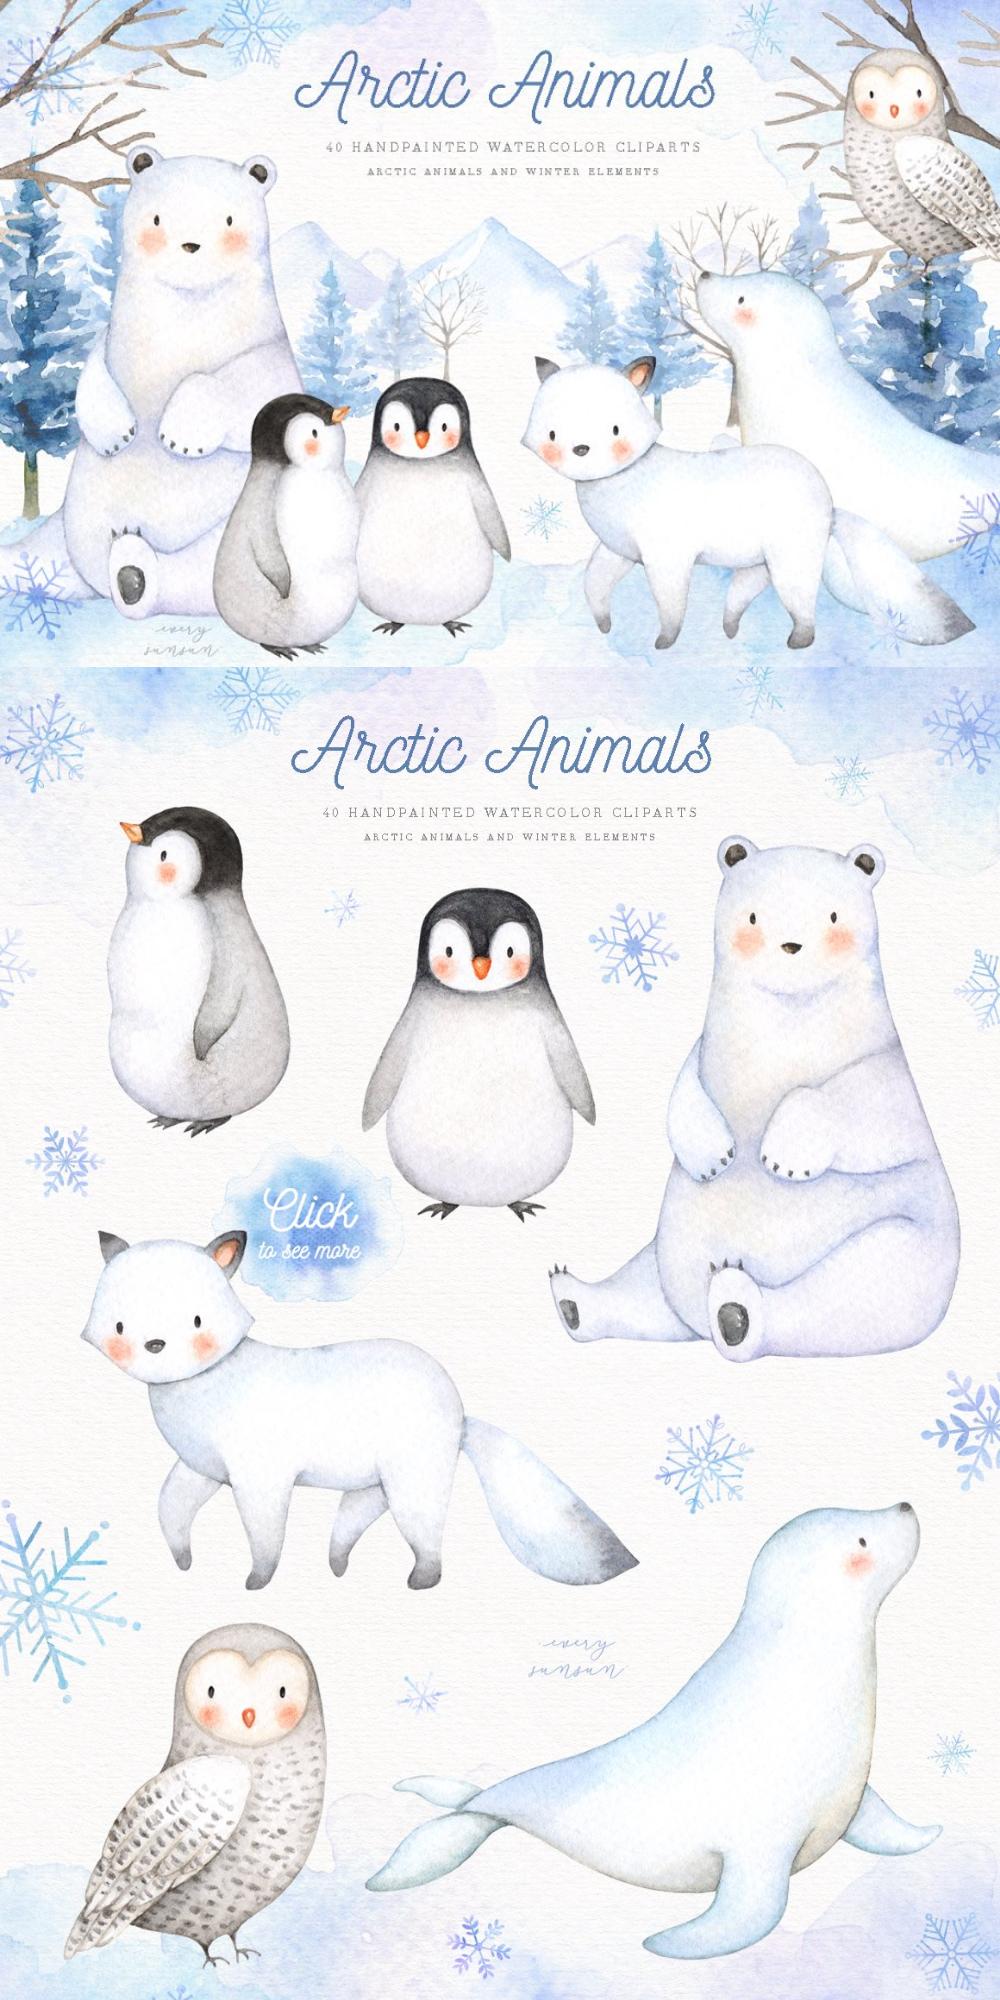 Arctic Animals Watercolor Clip Arts Polar Bear Illustration Animal Illustration Kids Polar Bear Drawing